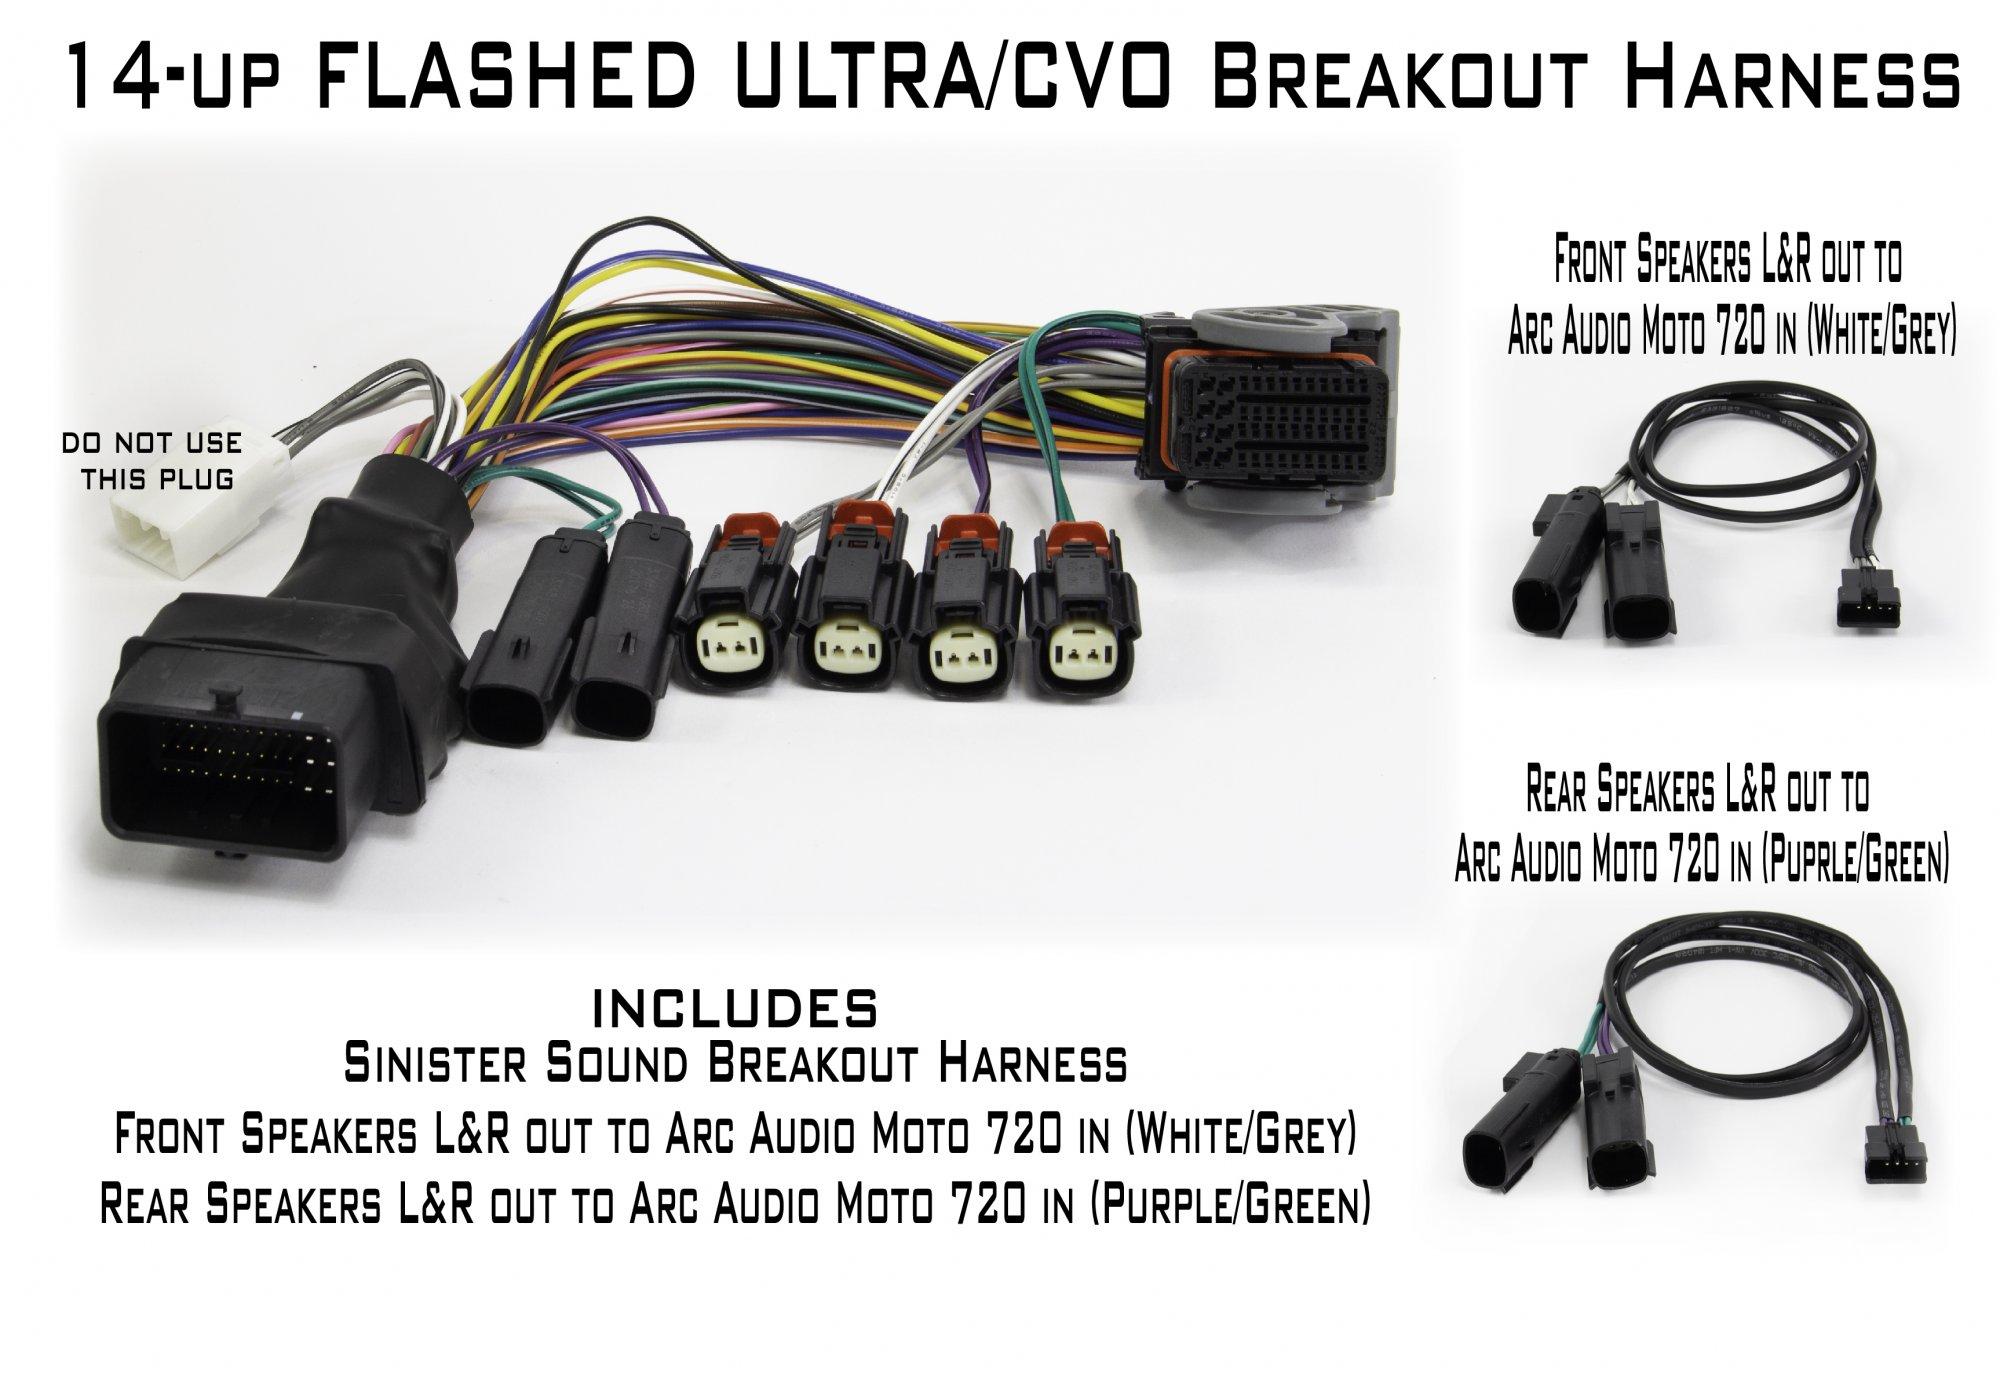 Sinister Sound Ultra/CVO breakout harness